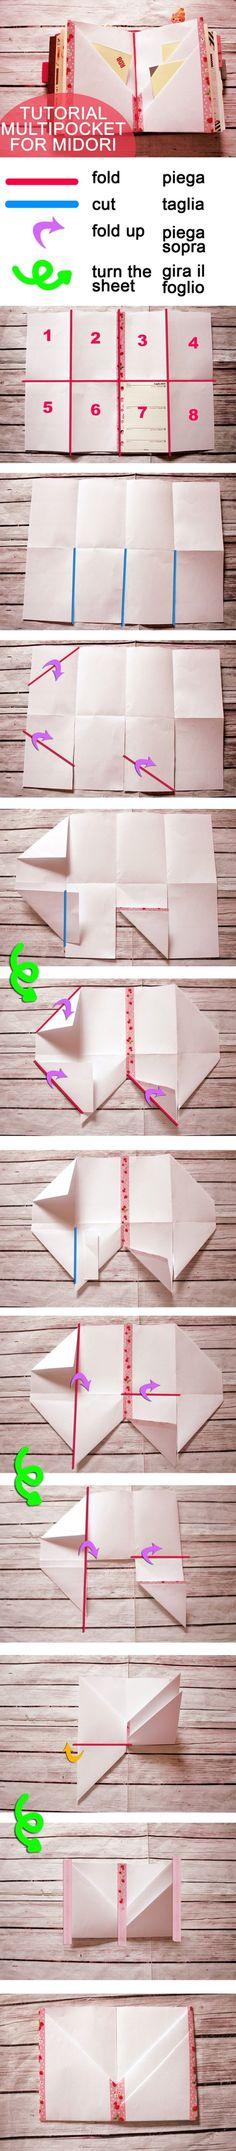 pocket tutorial from Lucy Wonderland, via Susan Angebranndt